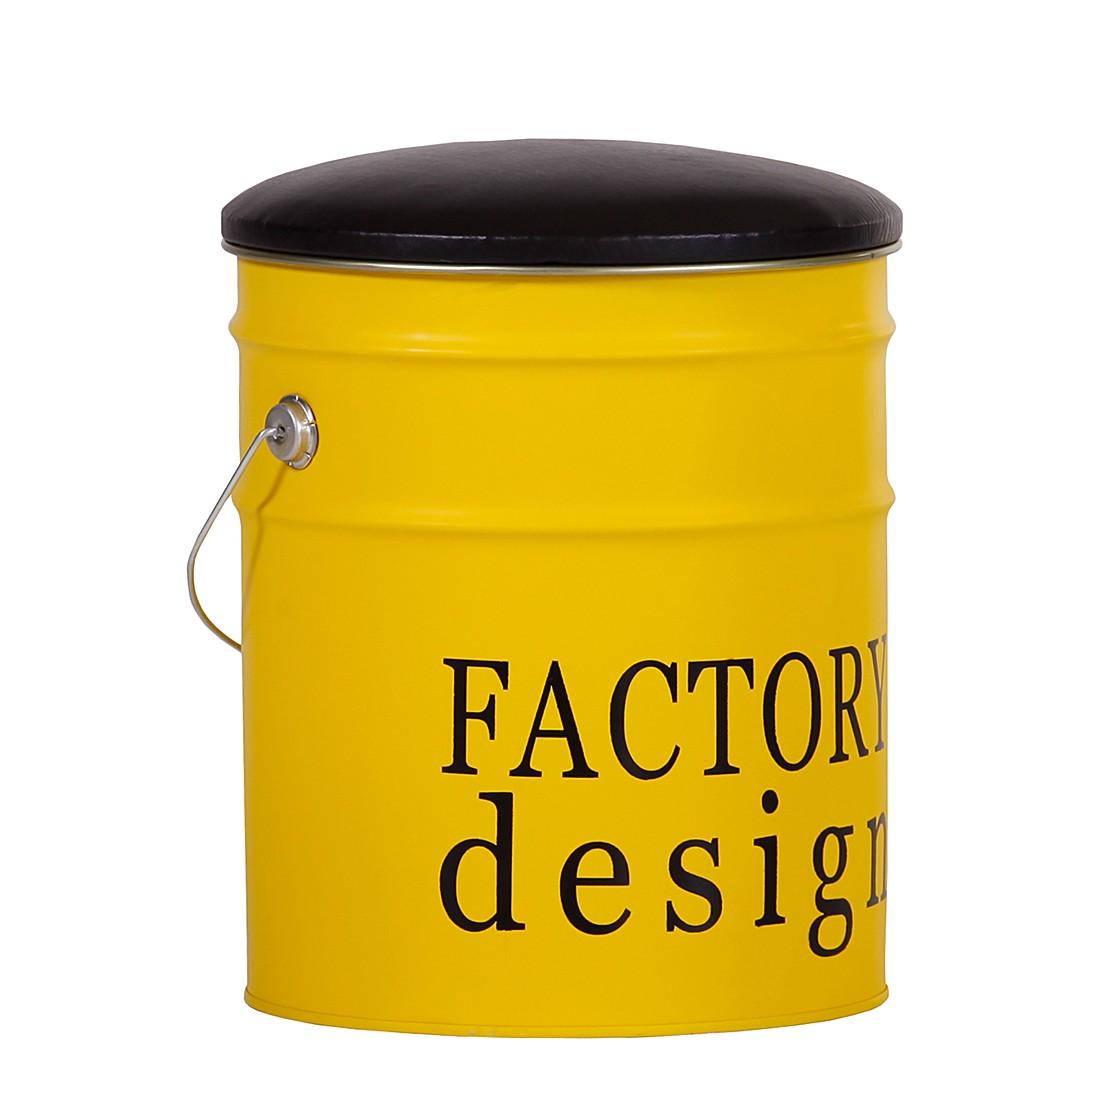 hocker tonela gelb furnlab m gf 000805 kauf dir. Black Bedroom Furniture Sets. Home Design Ideas